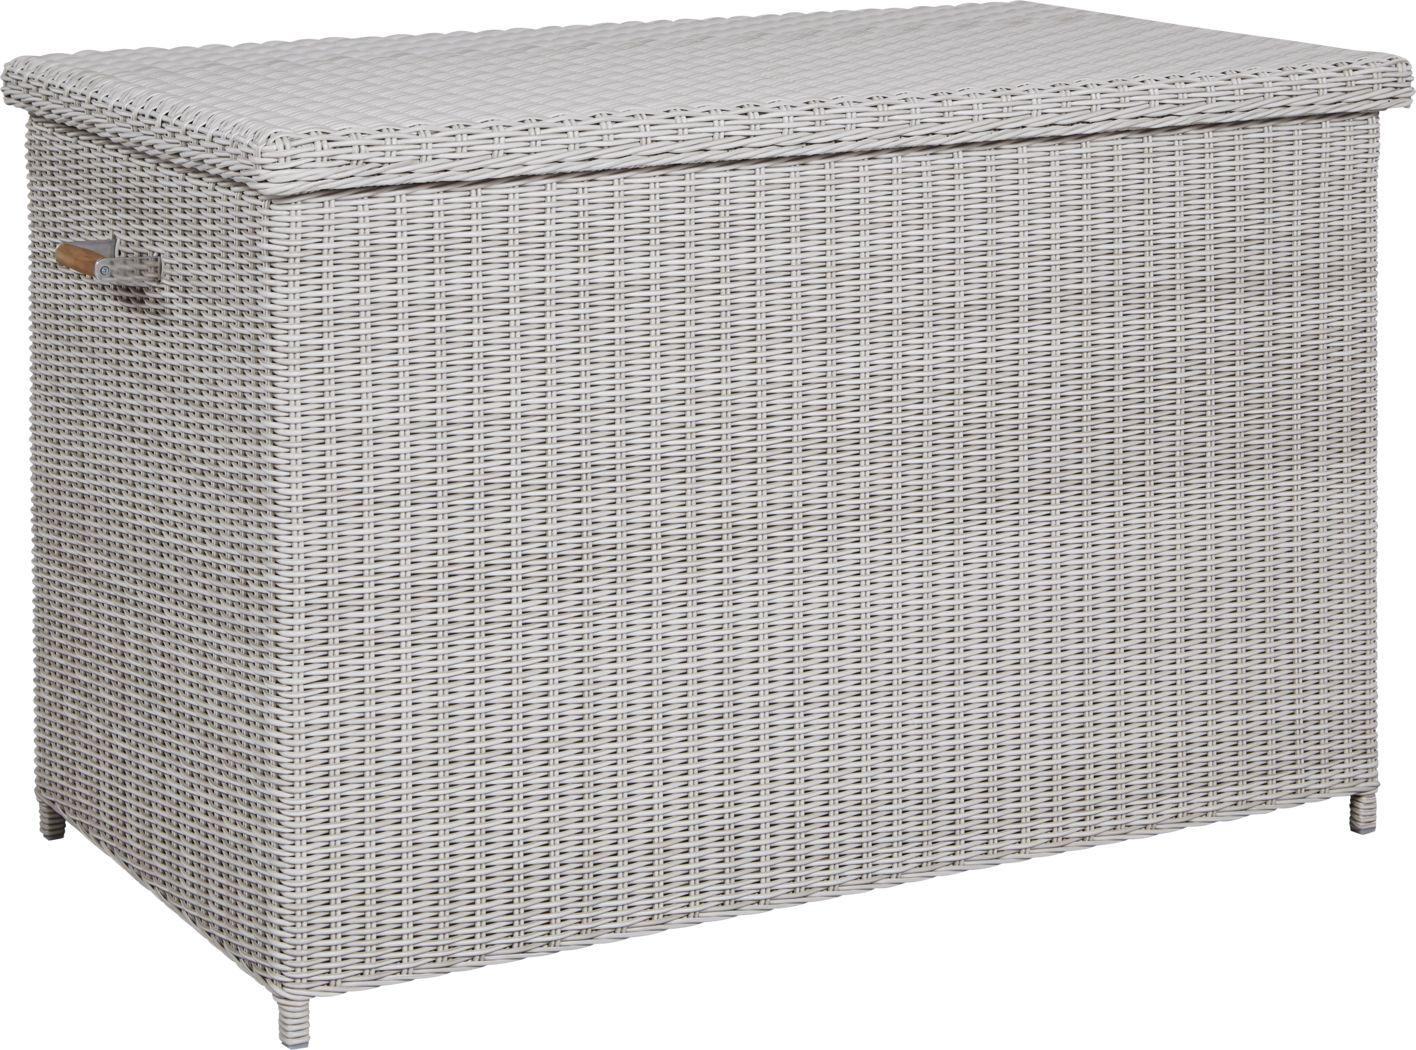 Patmos Gray Outdoor Cushion Storage Box